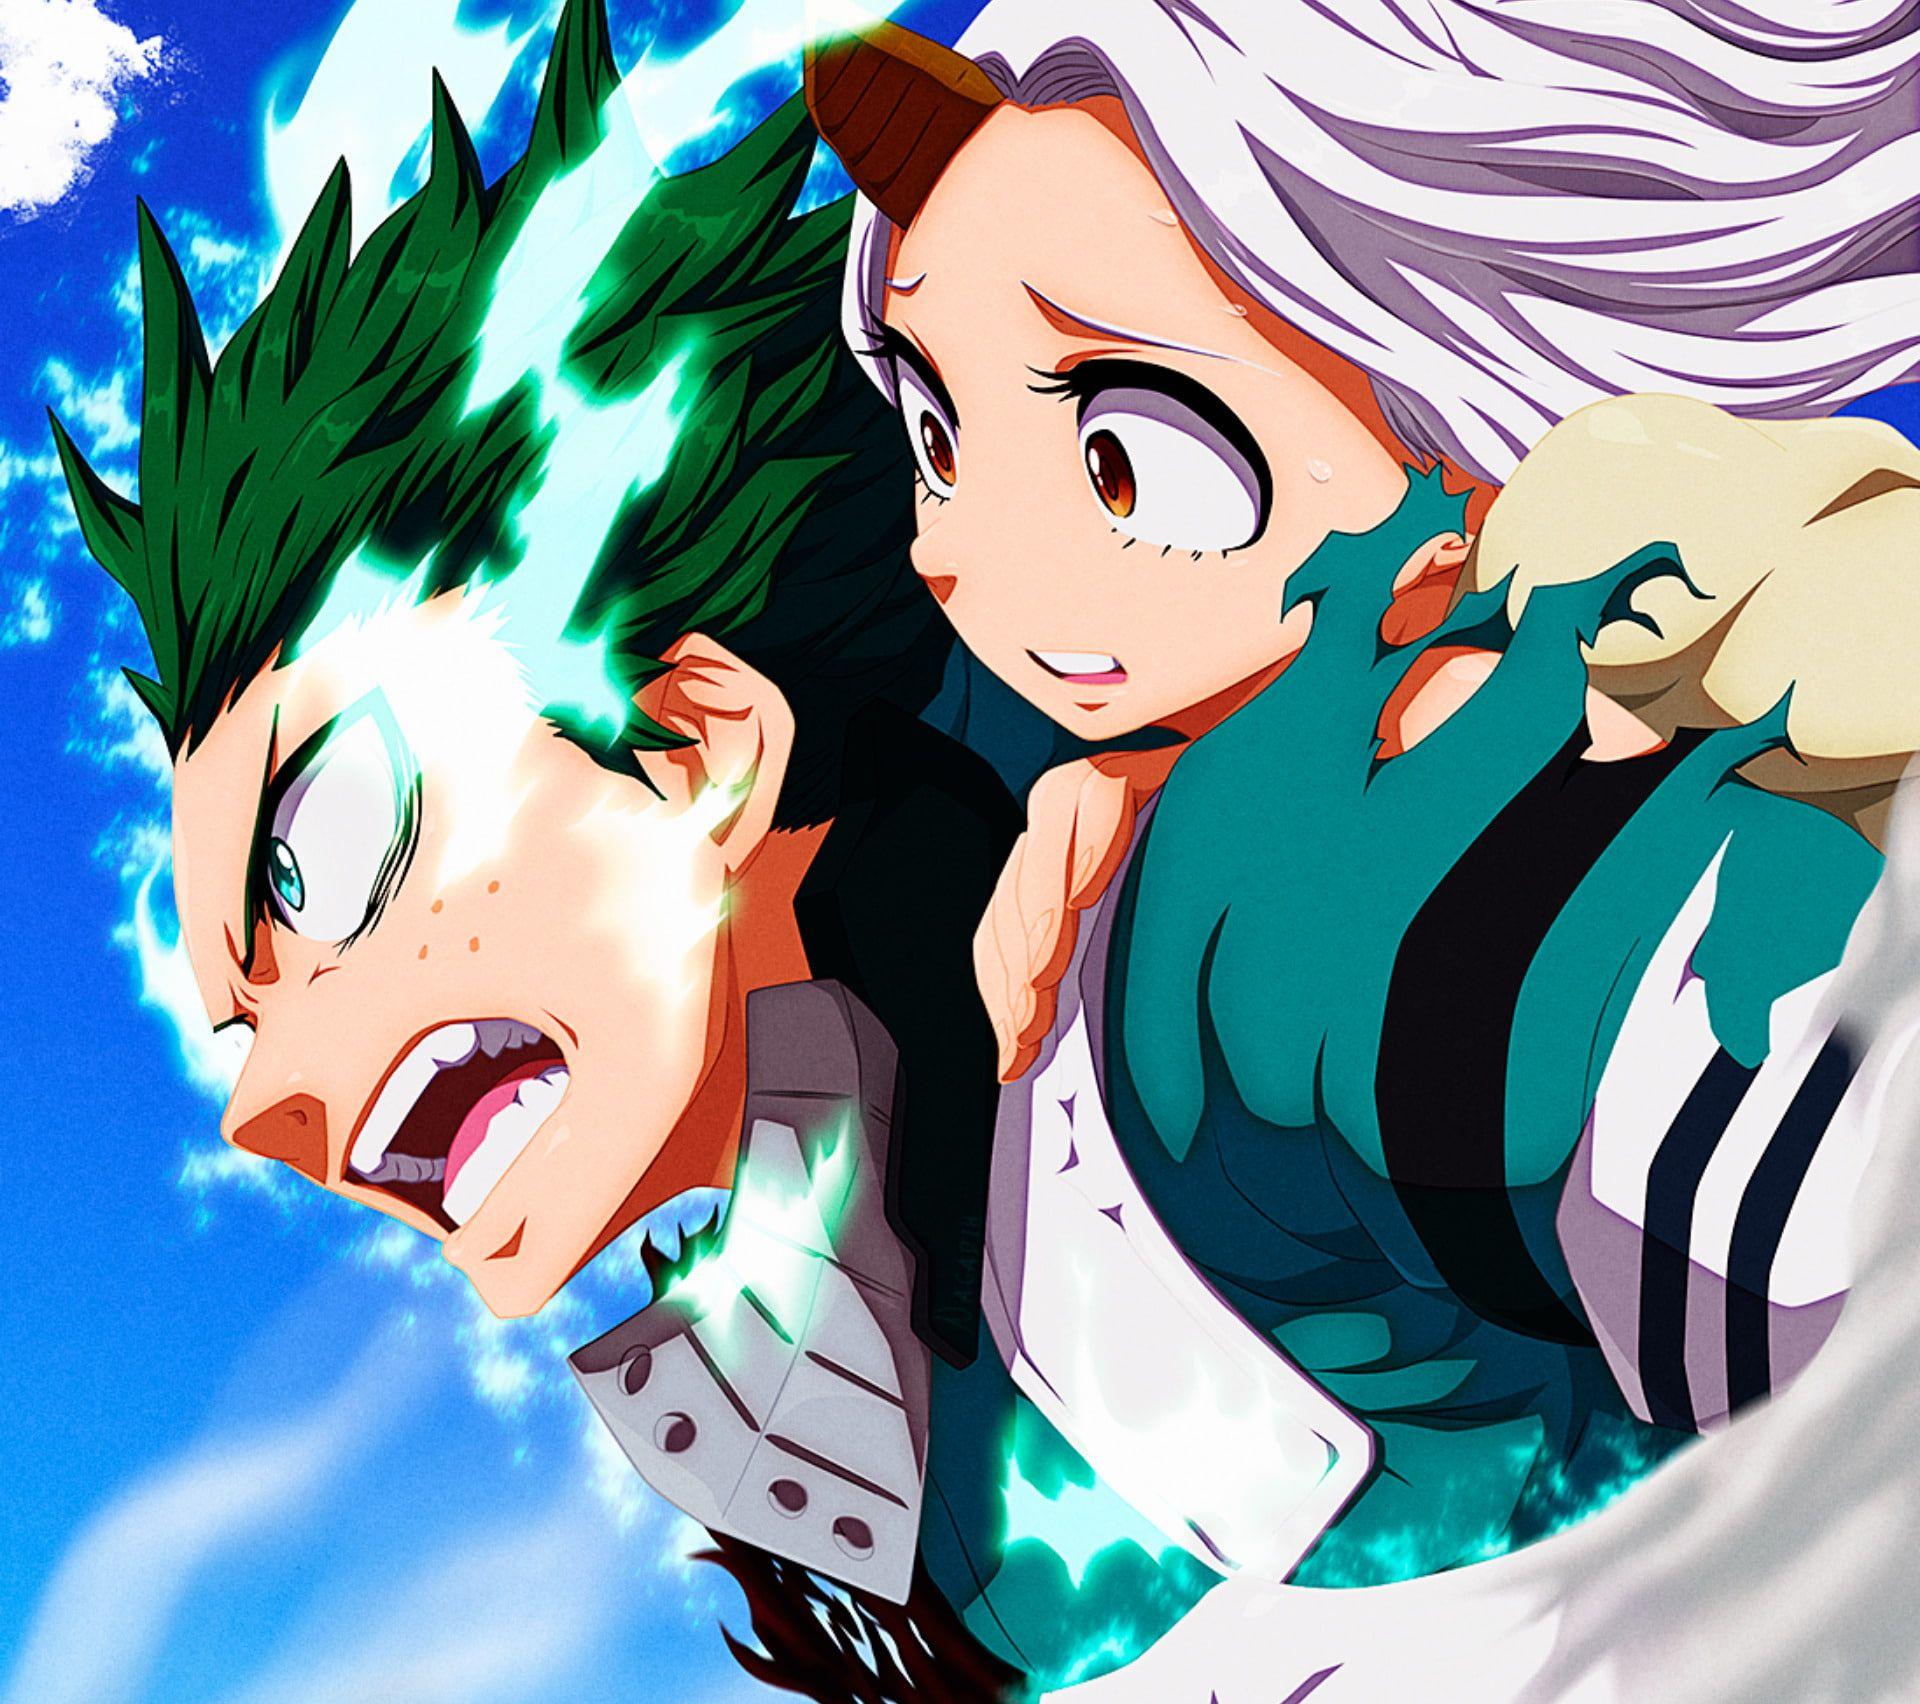 Anime My Hero Academia Eri (My Hero Academia) Izuku